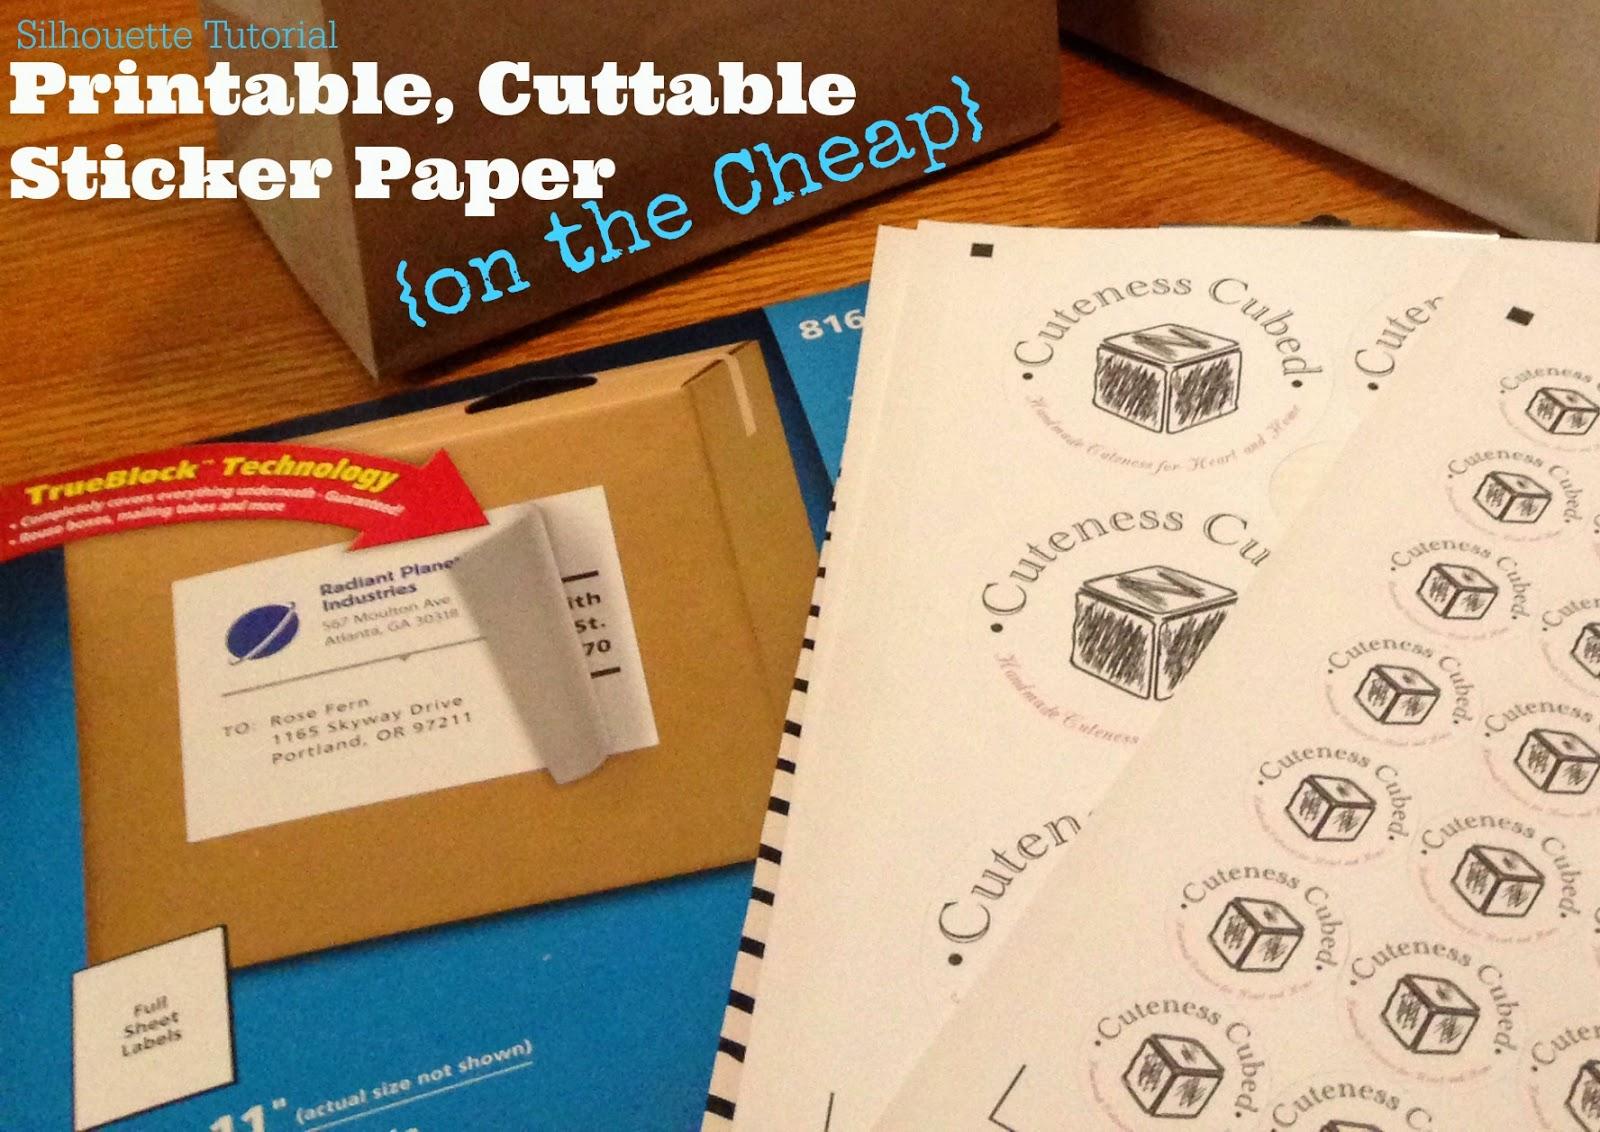 Silhouette White Sticker Paper Alternative On The Cheap